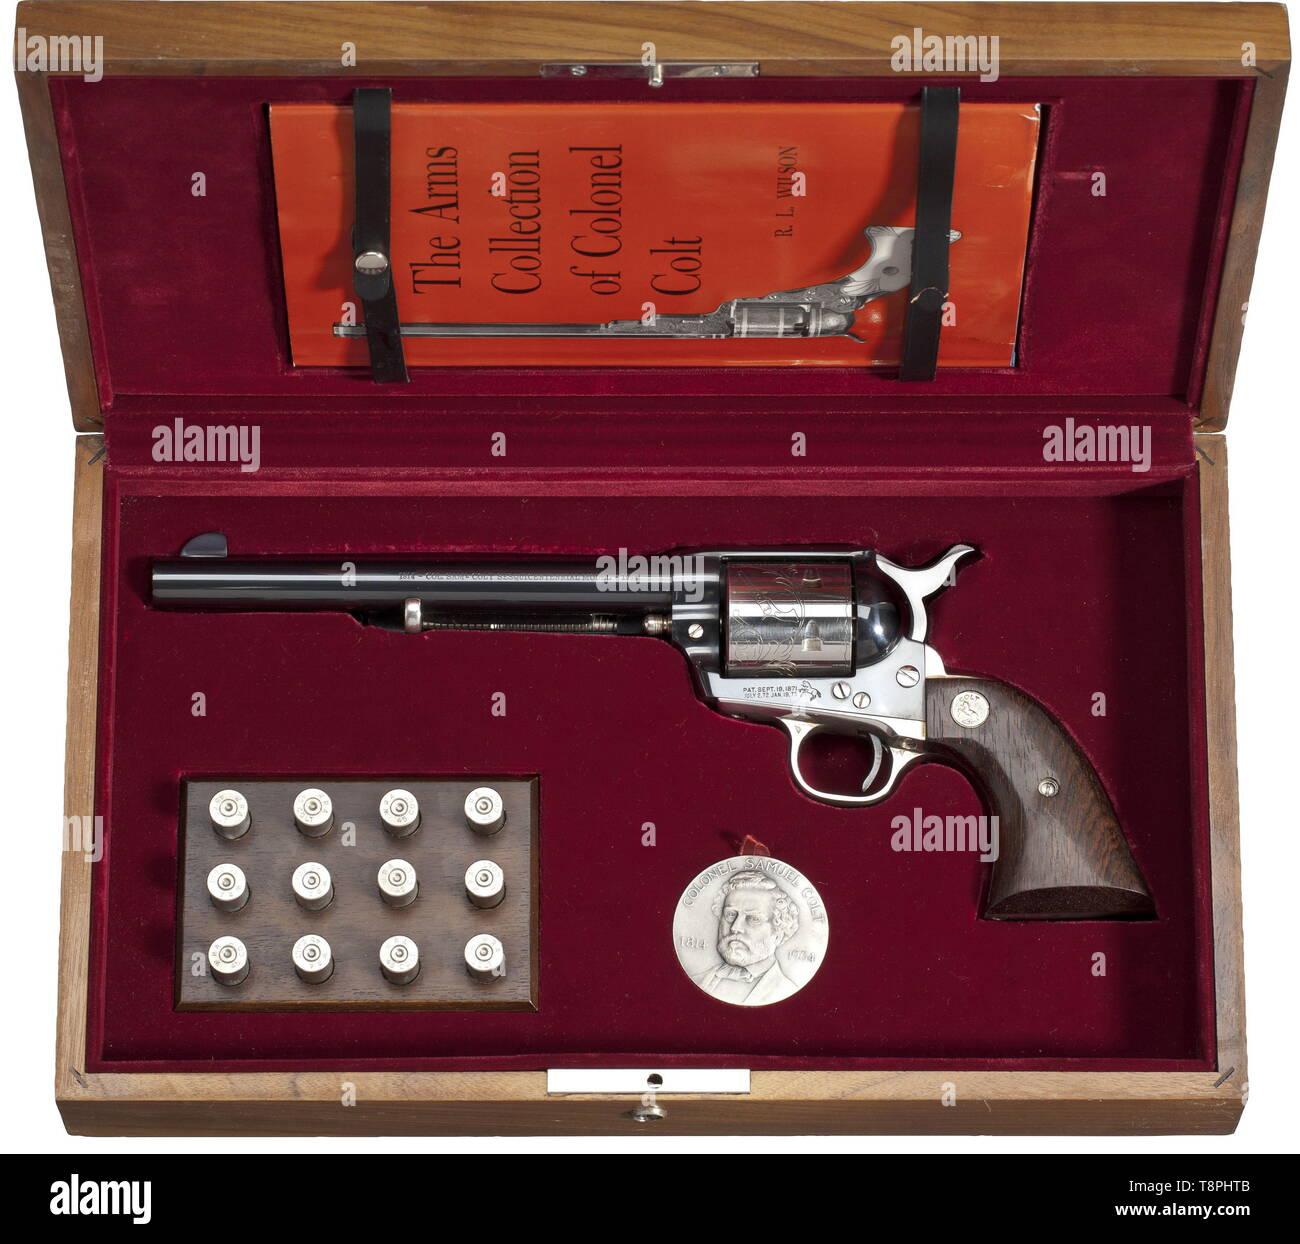 An 2 Colt Stock Photos & An 2 Colt Stock Images - Alamy